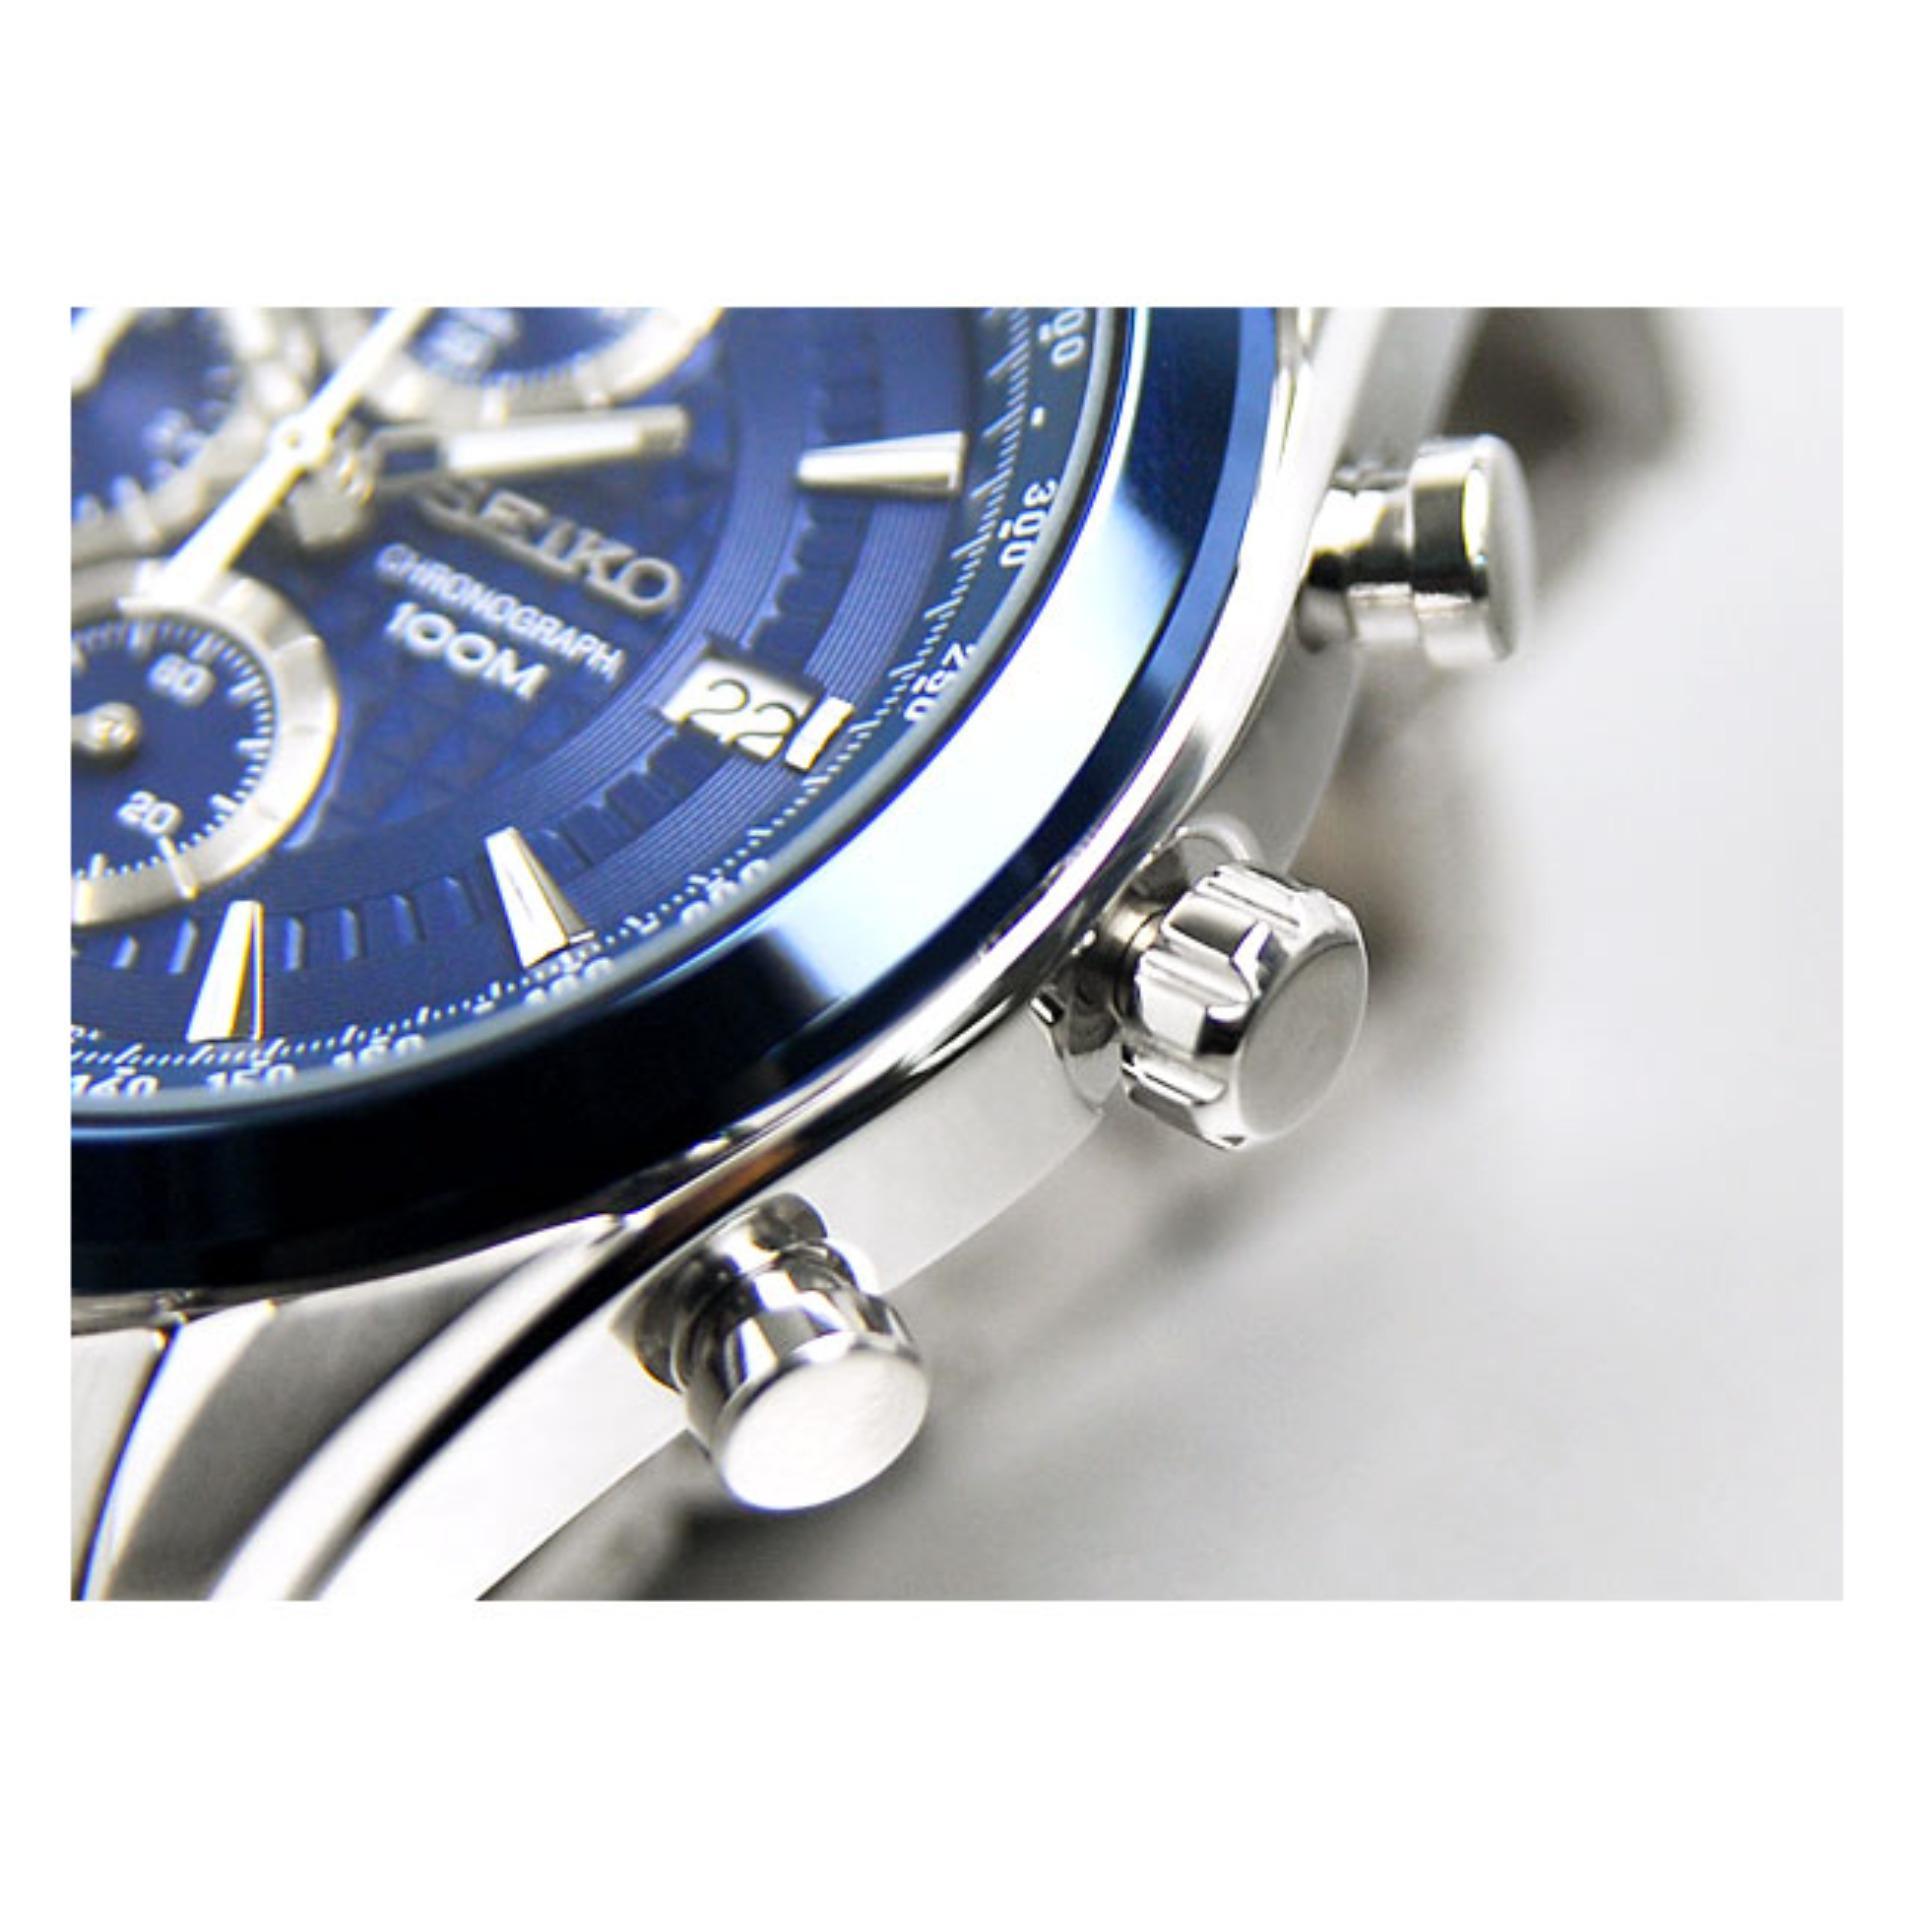 Seiko Chronograph Jam Tangan Pria Strap Stainless Stell Ssb177p1 Sna793p1 Steel Silver Blue Navy